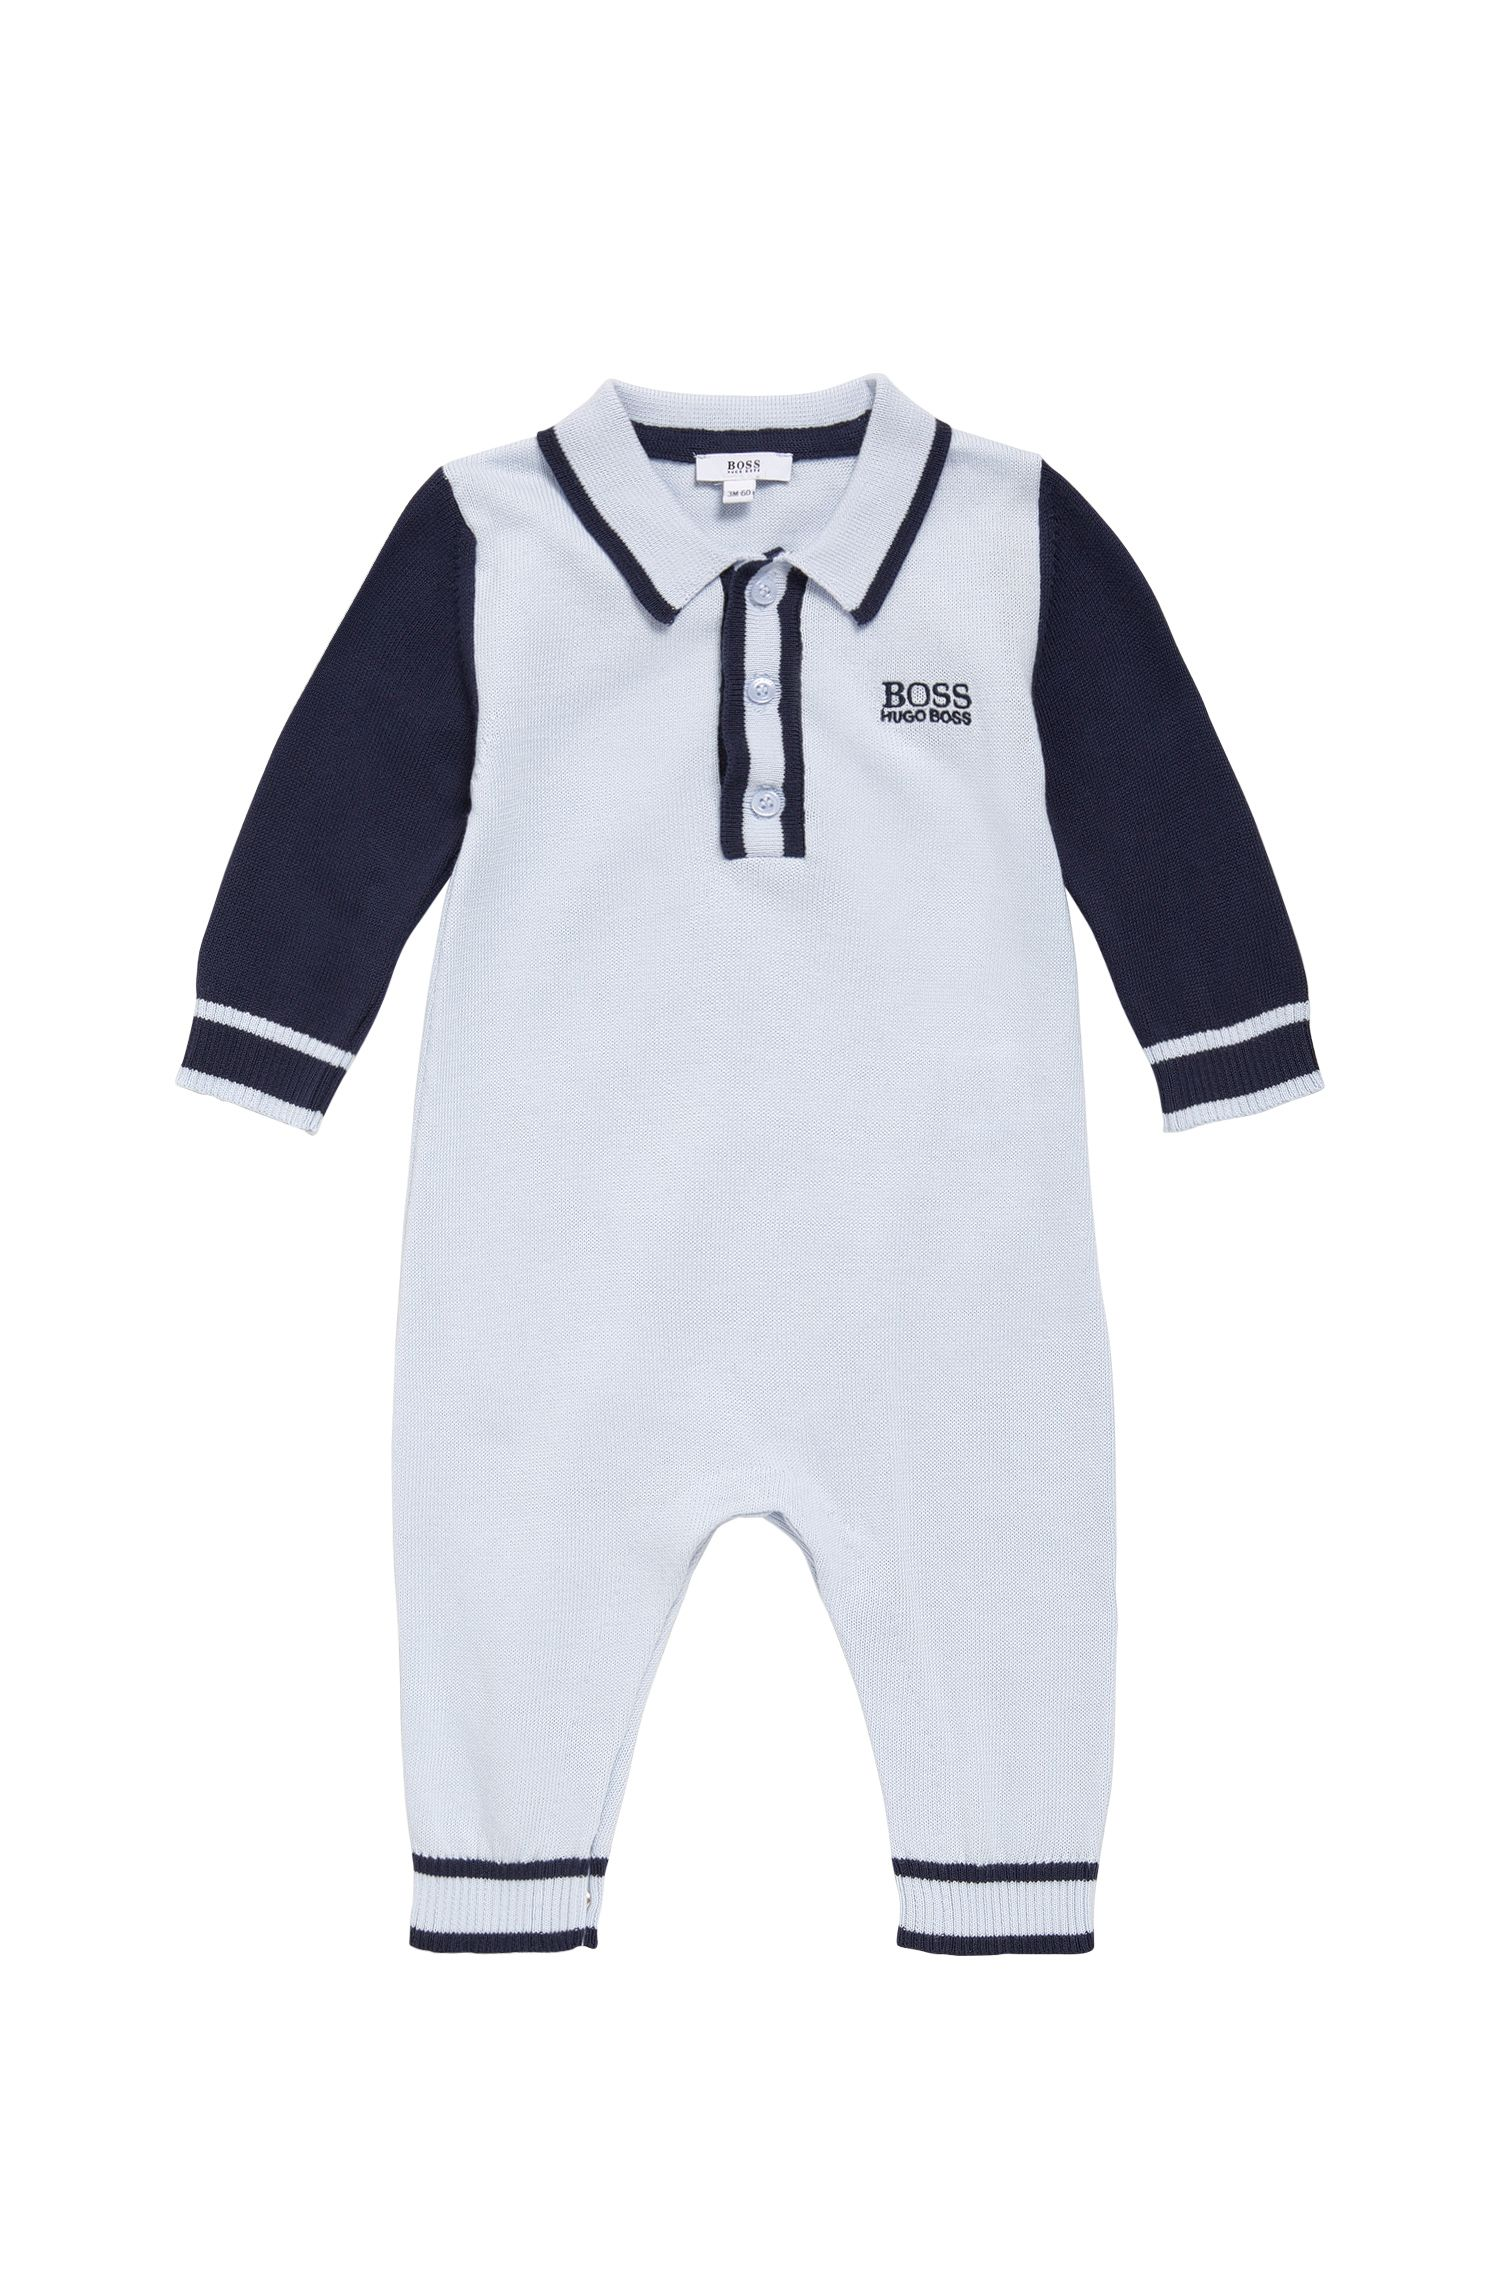 Mono para bebé en algodón de punto fino: 'J94169'